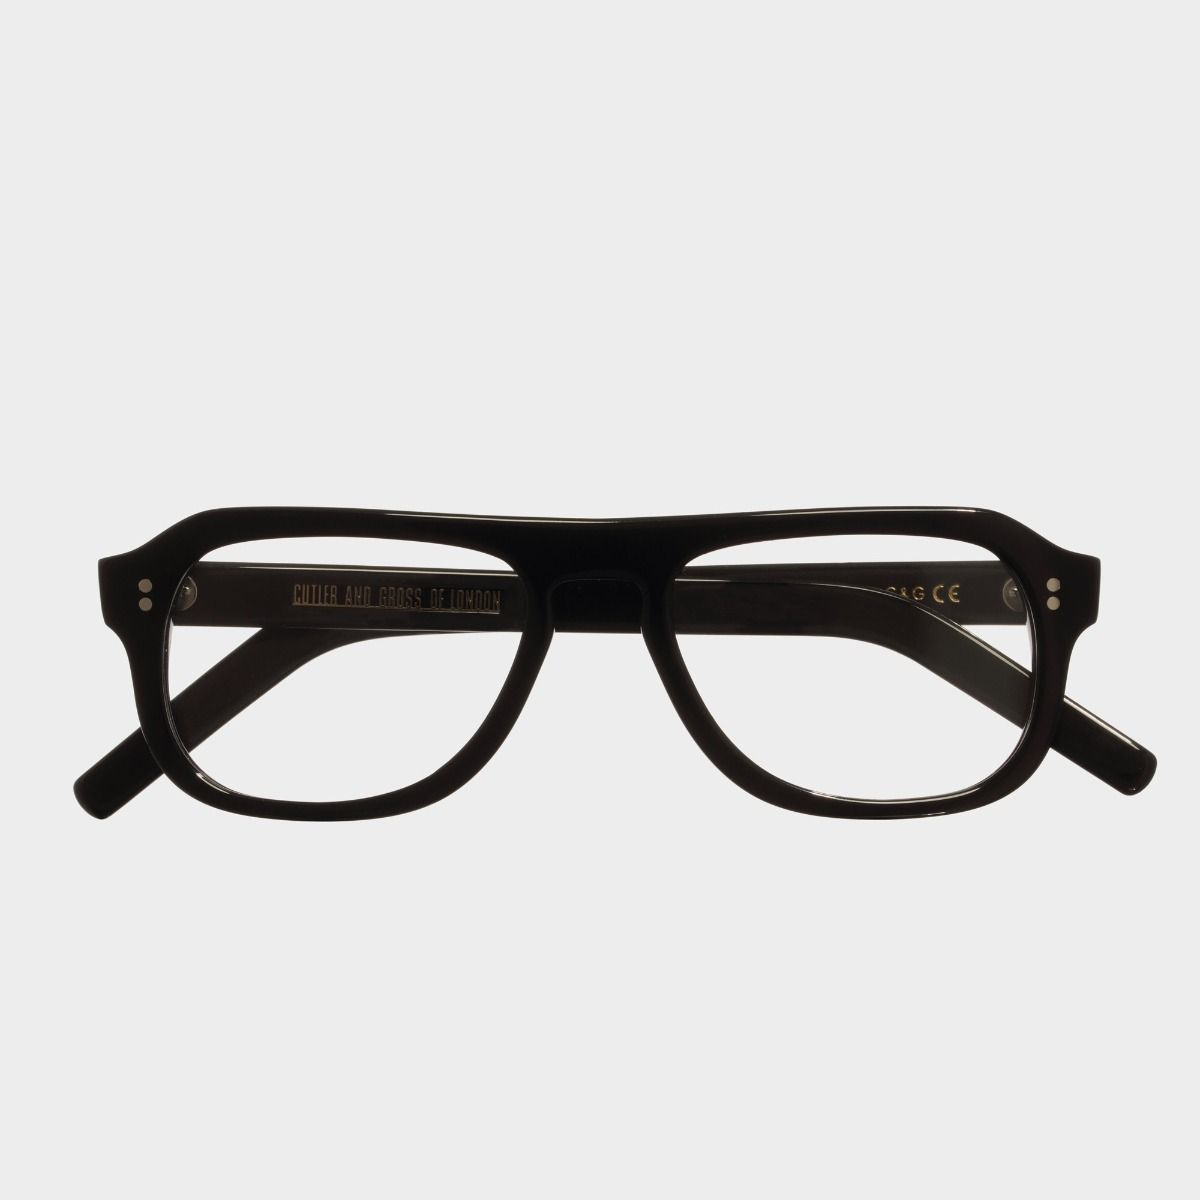 0822 Optical Aviator Glasses-Black